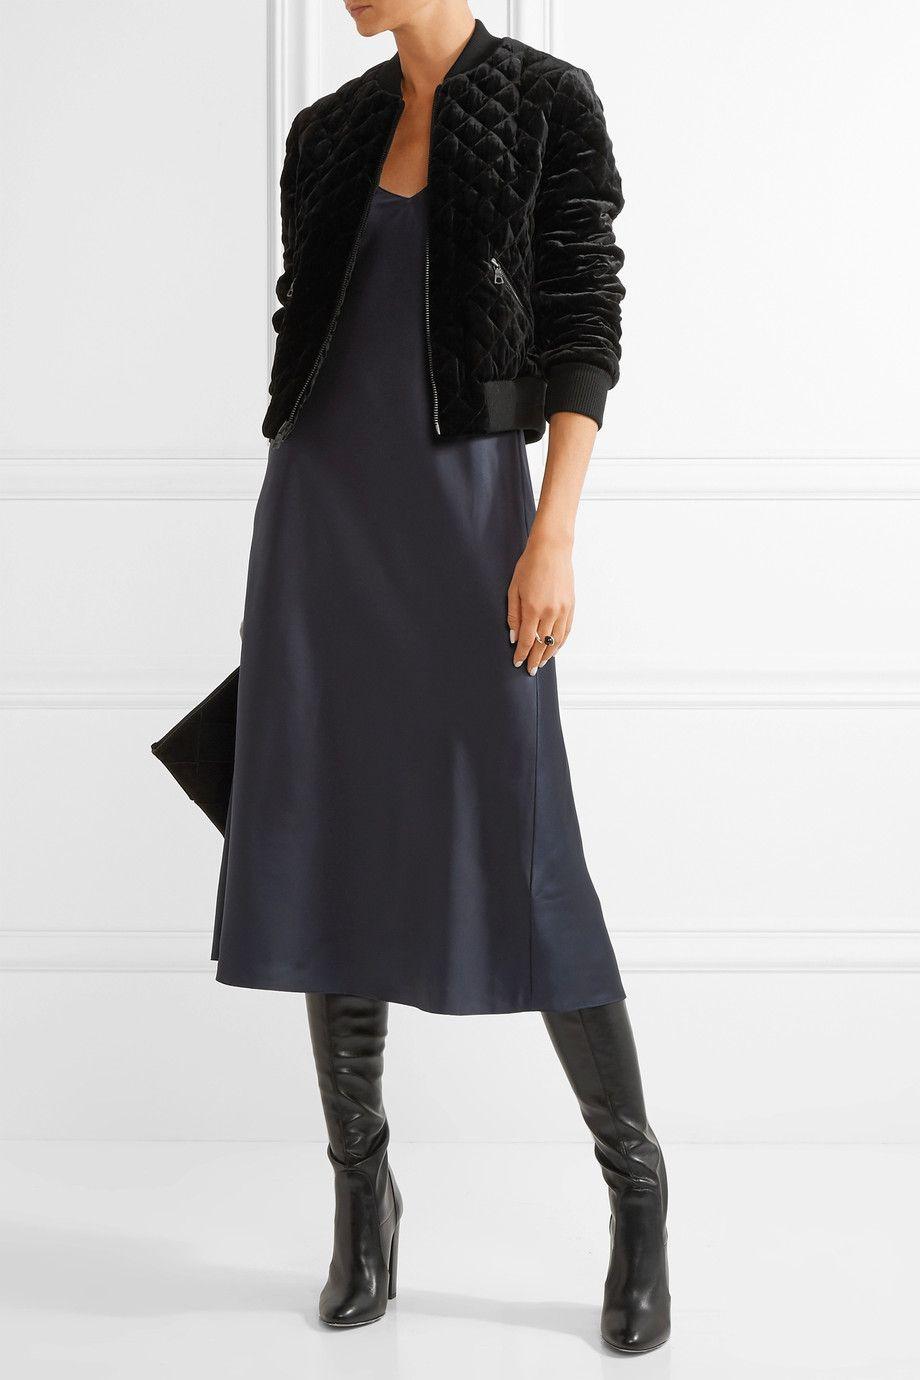 a4f4fbddefb47 Alice + Olivia | Demia quilted velvet bomber jacket | NET-A-PORTER.COM